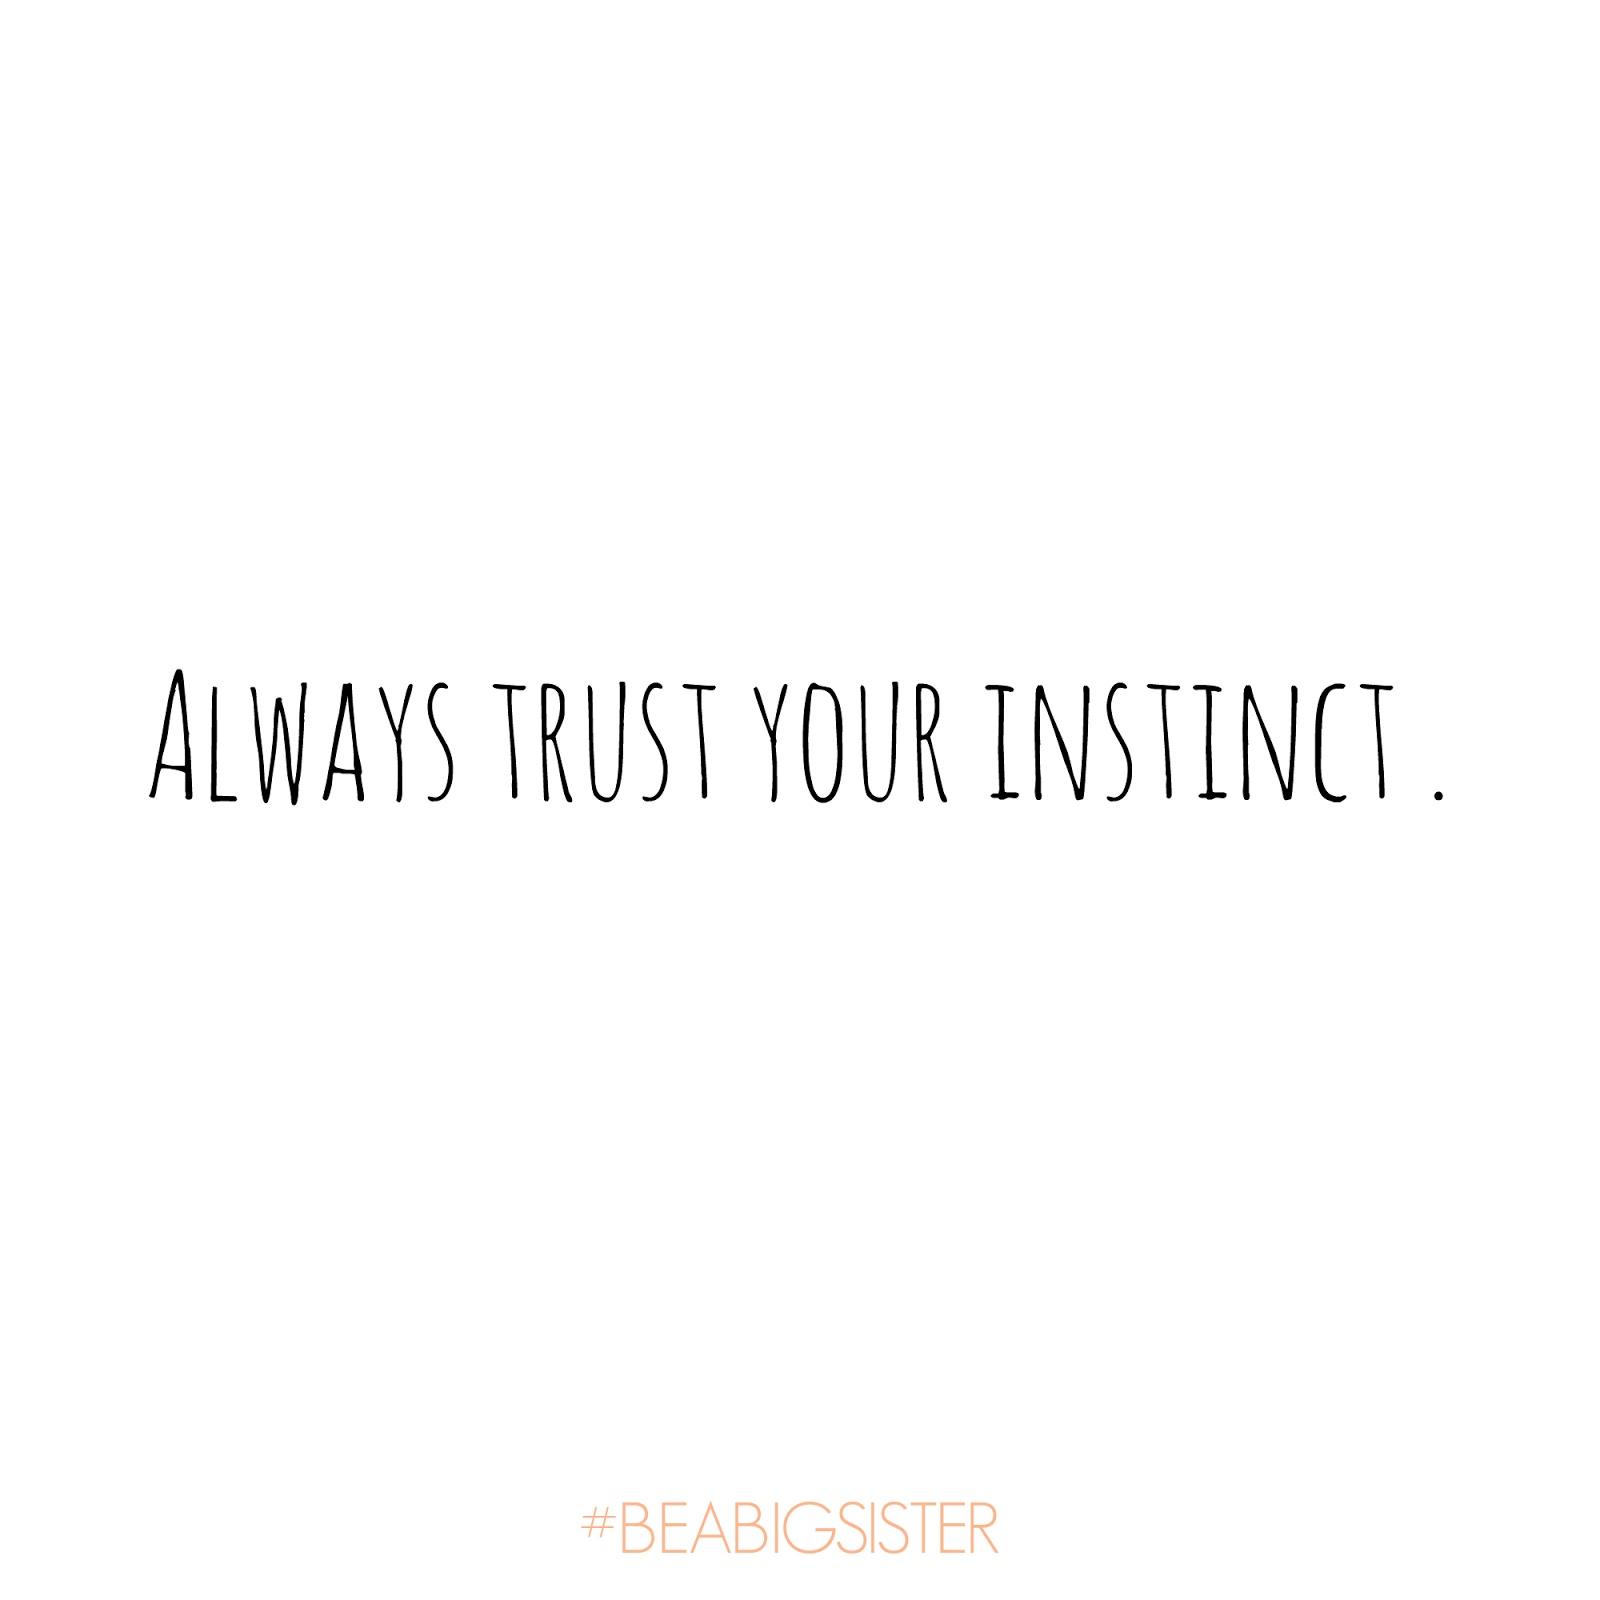 What is instinct 55